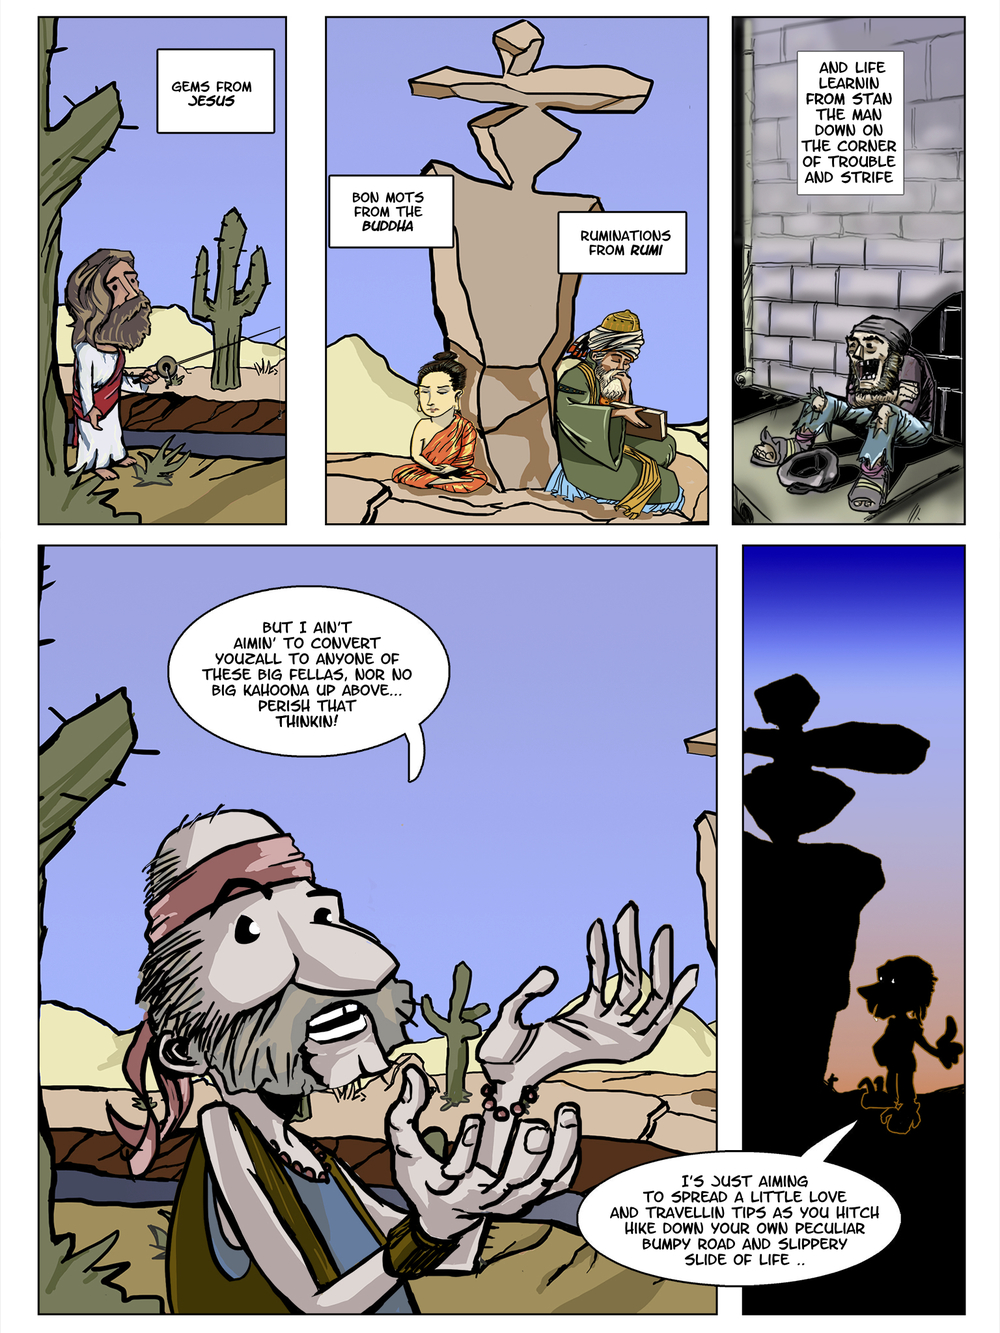 welcome comic__narration peter moyes_art darren fisher.jpg